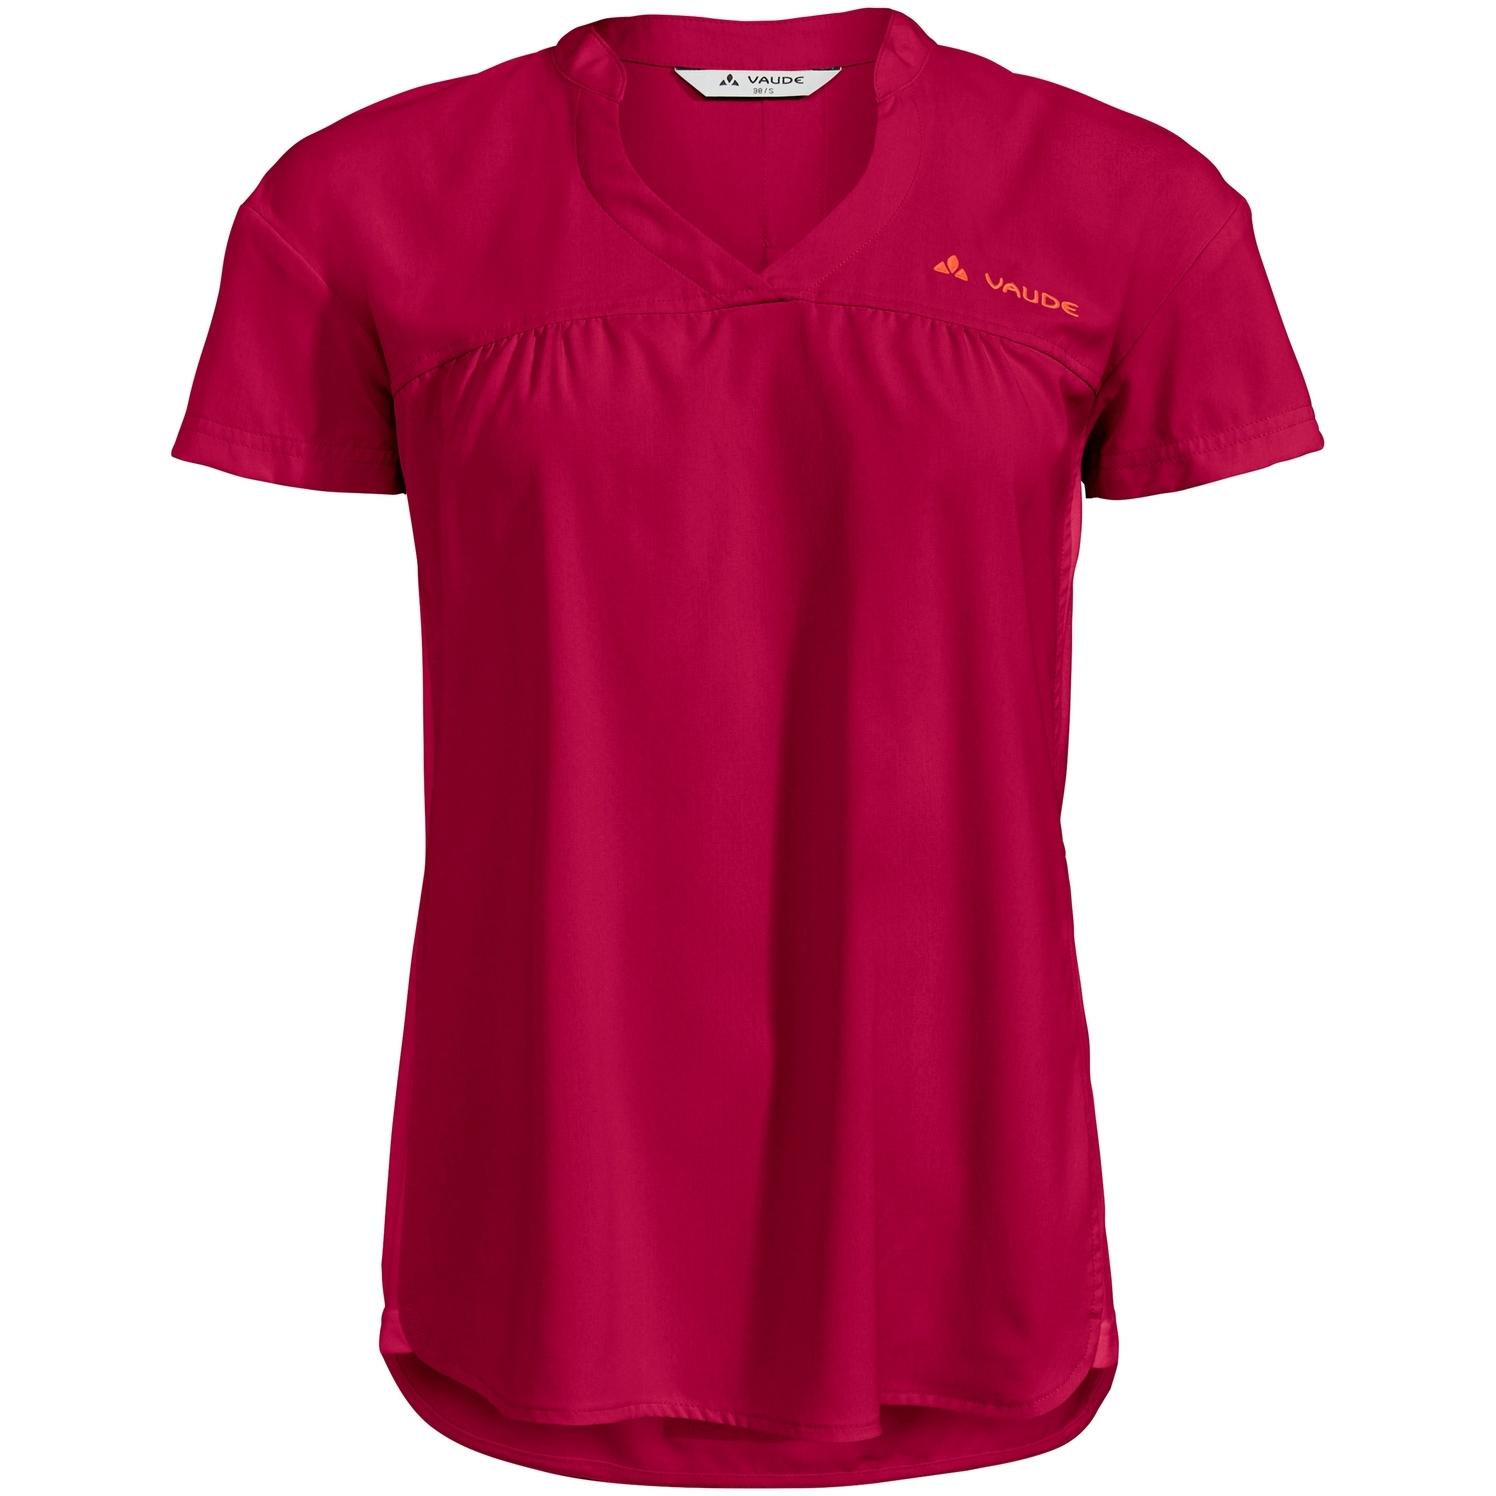 Vaude Turifo Damen Hybrid-Shirt - crimson red uni